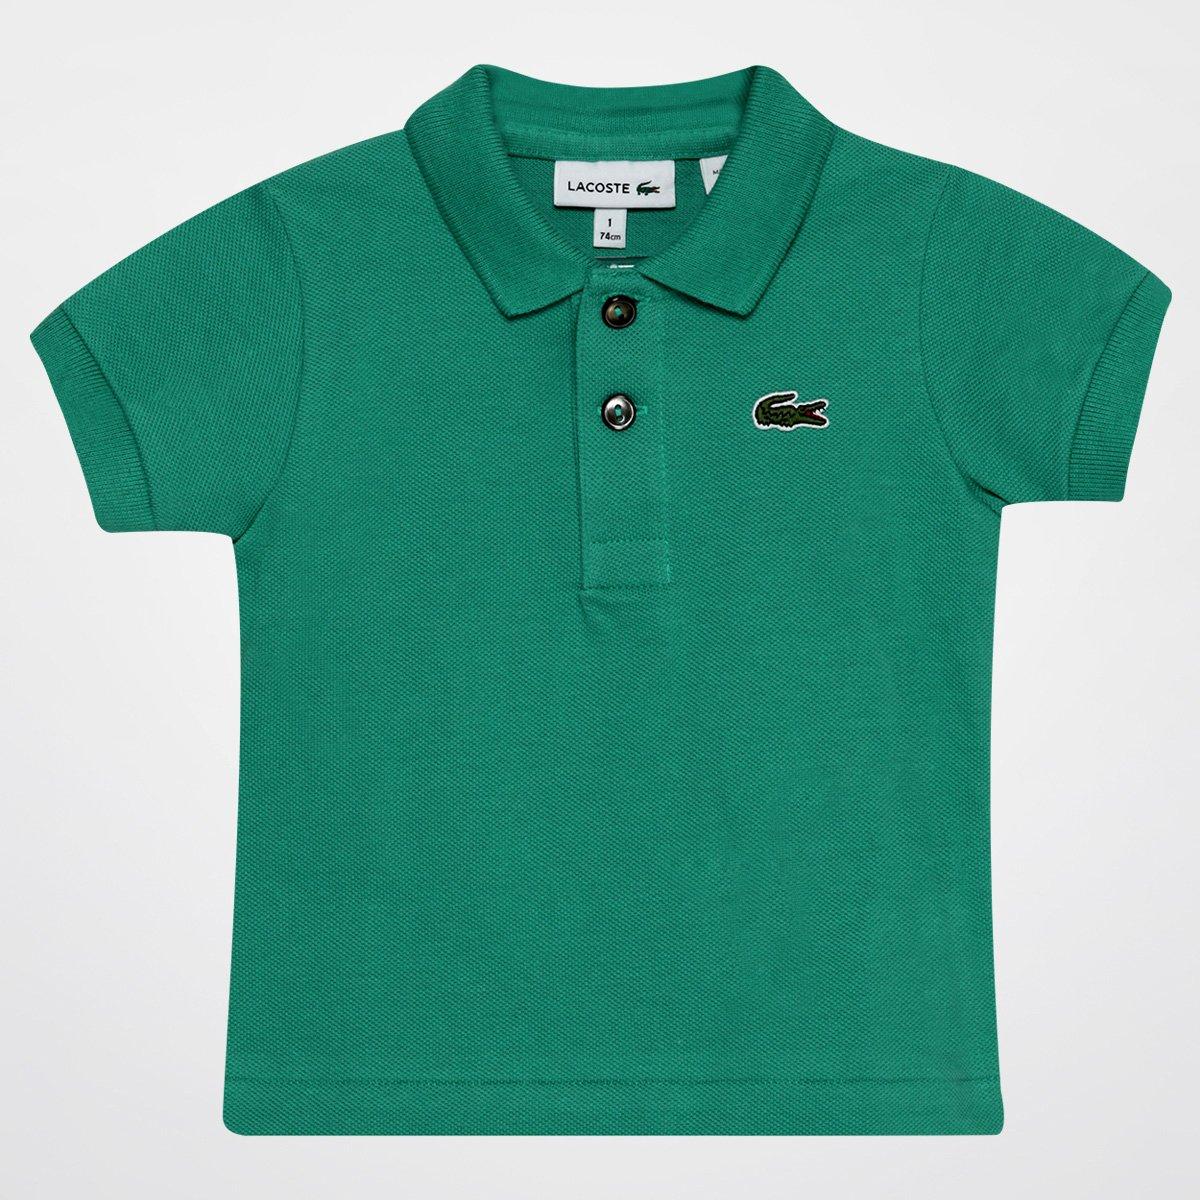 35e8050ef1b76 Camisa Polo Lacoste Piquet Infantil - Compre Agora